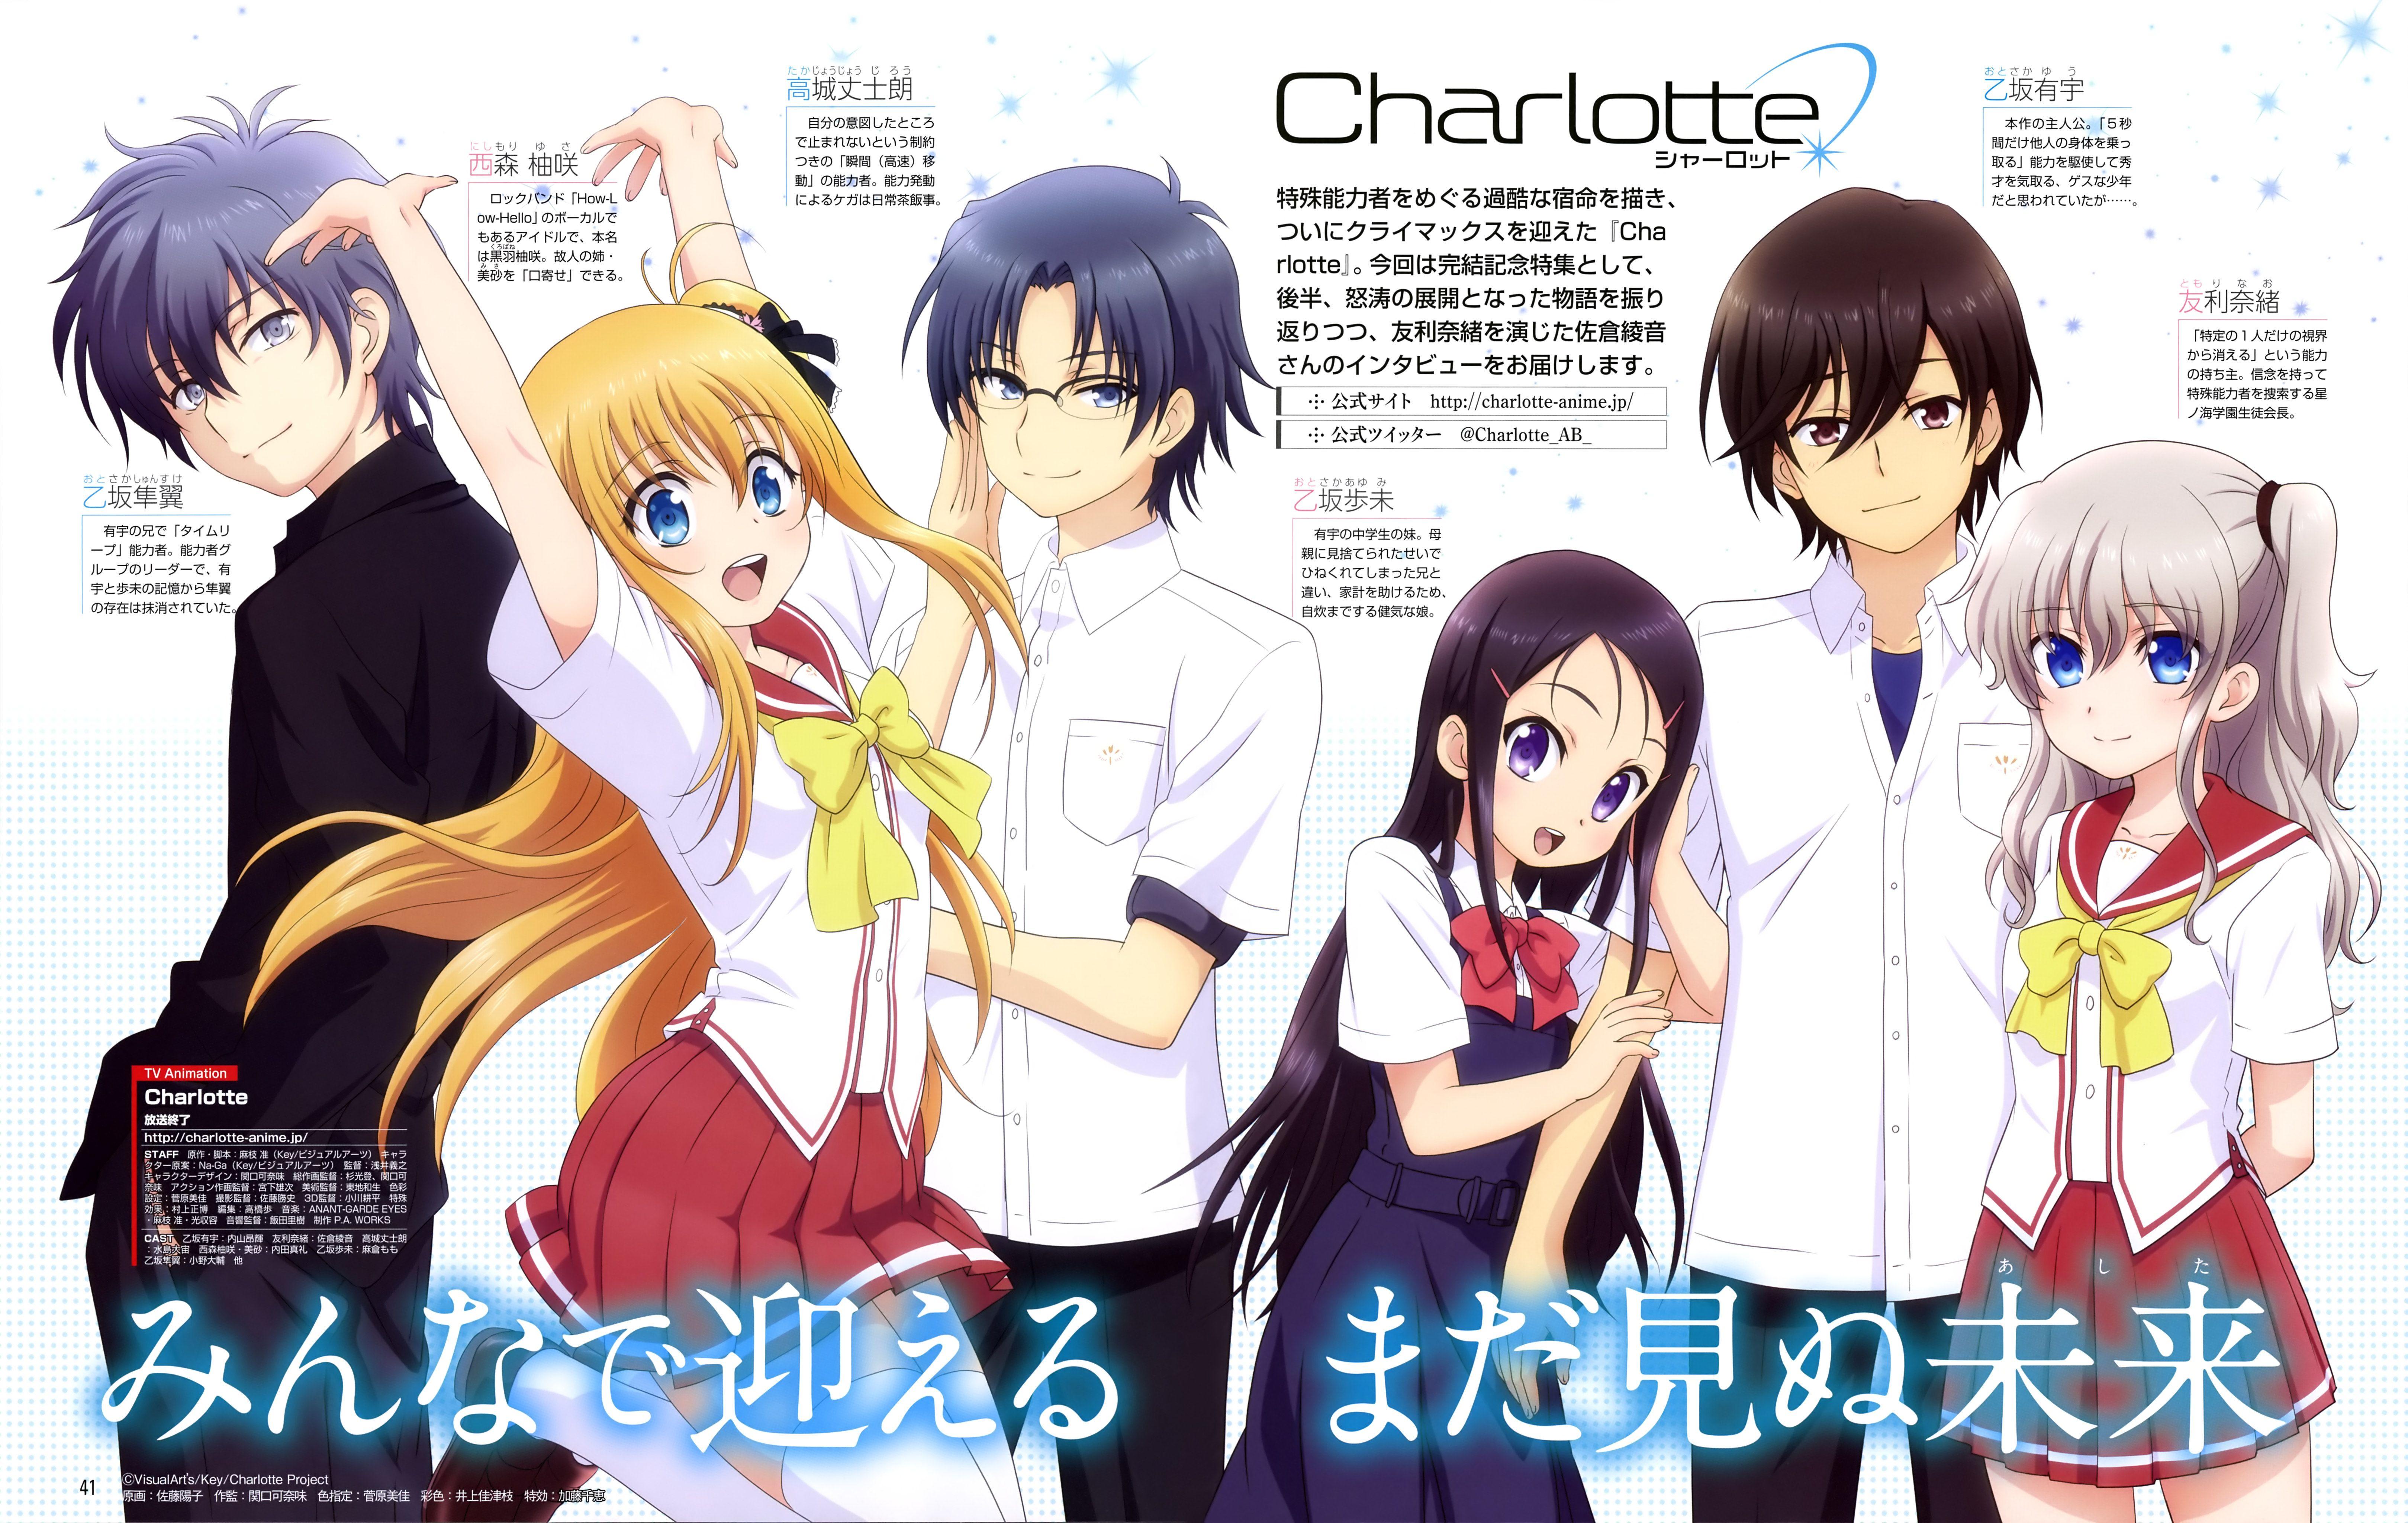 P.A. Works, Charlotte (Series), Otosaka Yuu, Otosaka